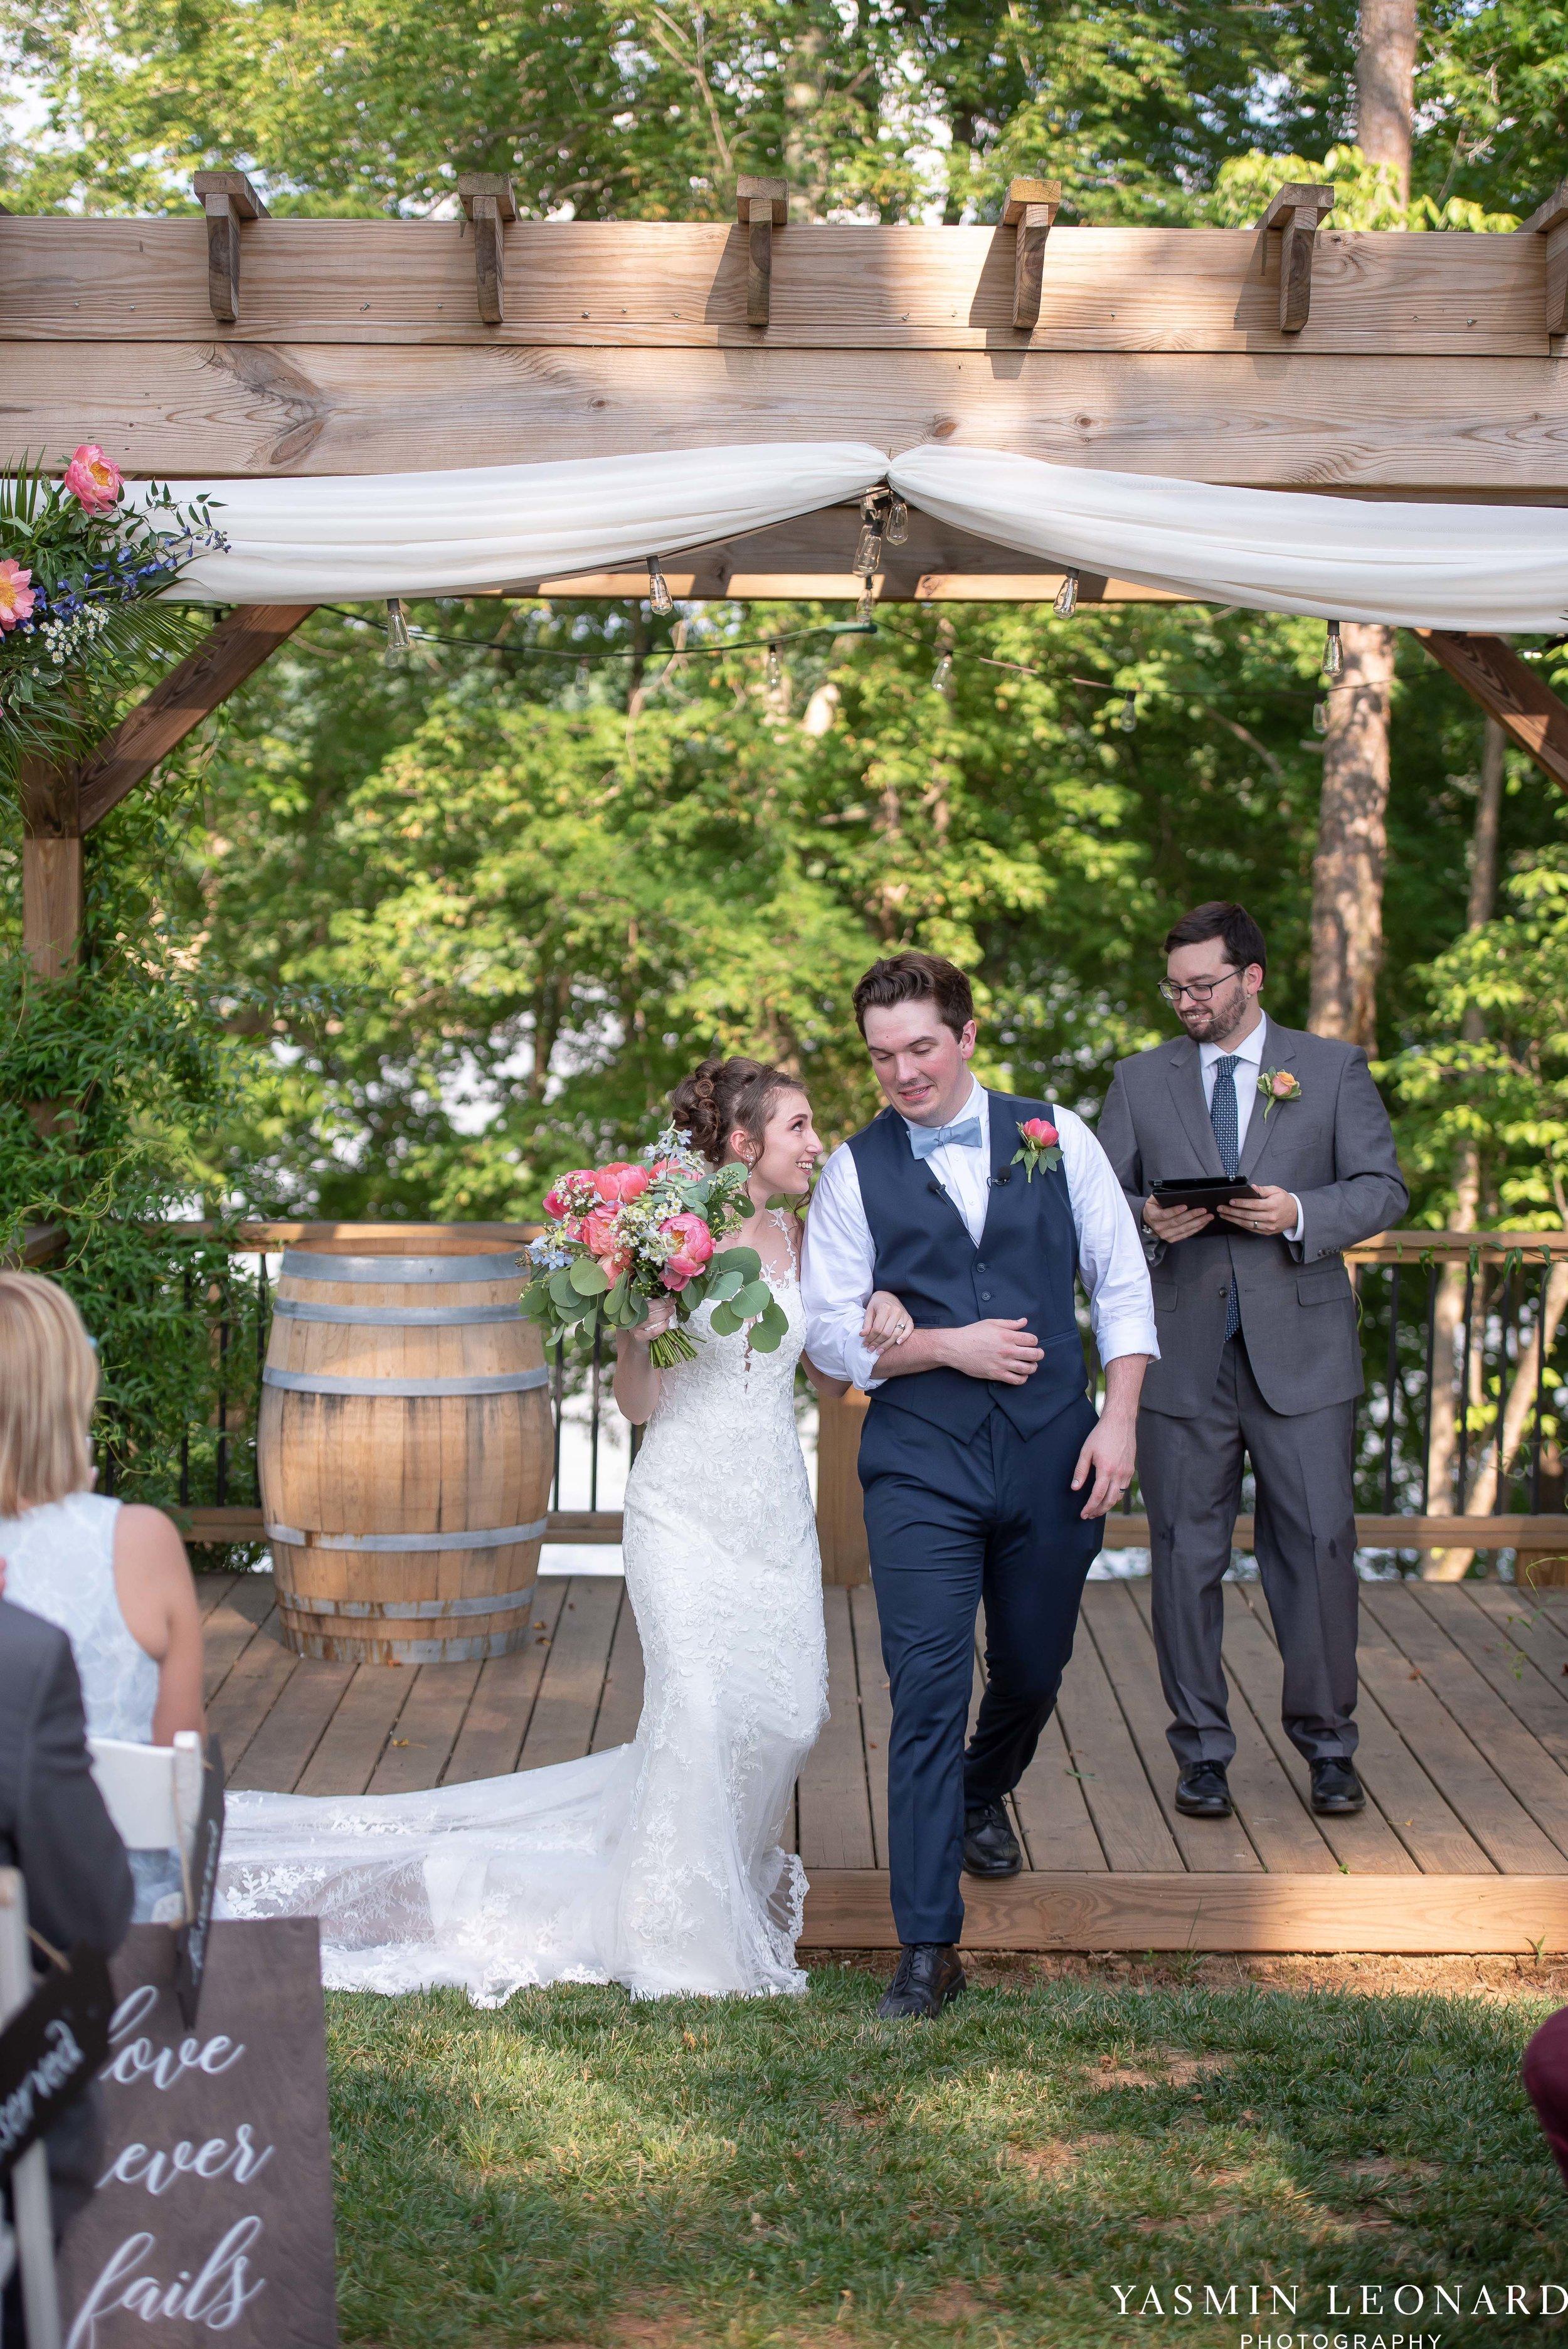 Old Homeplace Vineyard - NC Weddings - Outdoor Summer Weddings - Peony Boutique - Vineyard Wedding - NC Photographer - Yasmin Leonard Photography-33.jpg